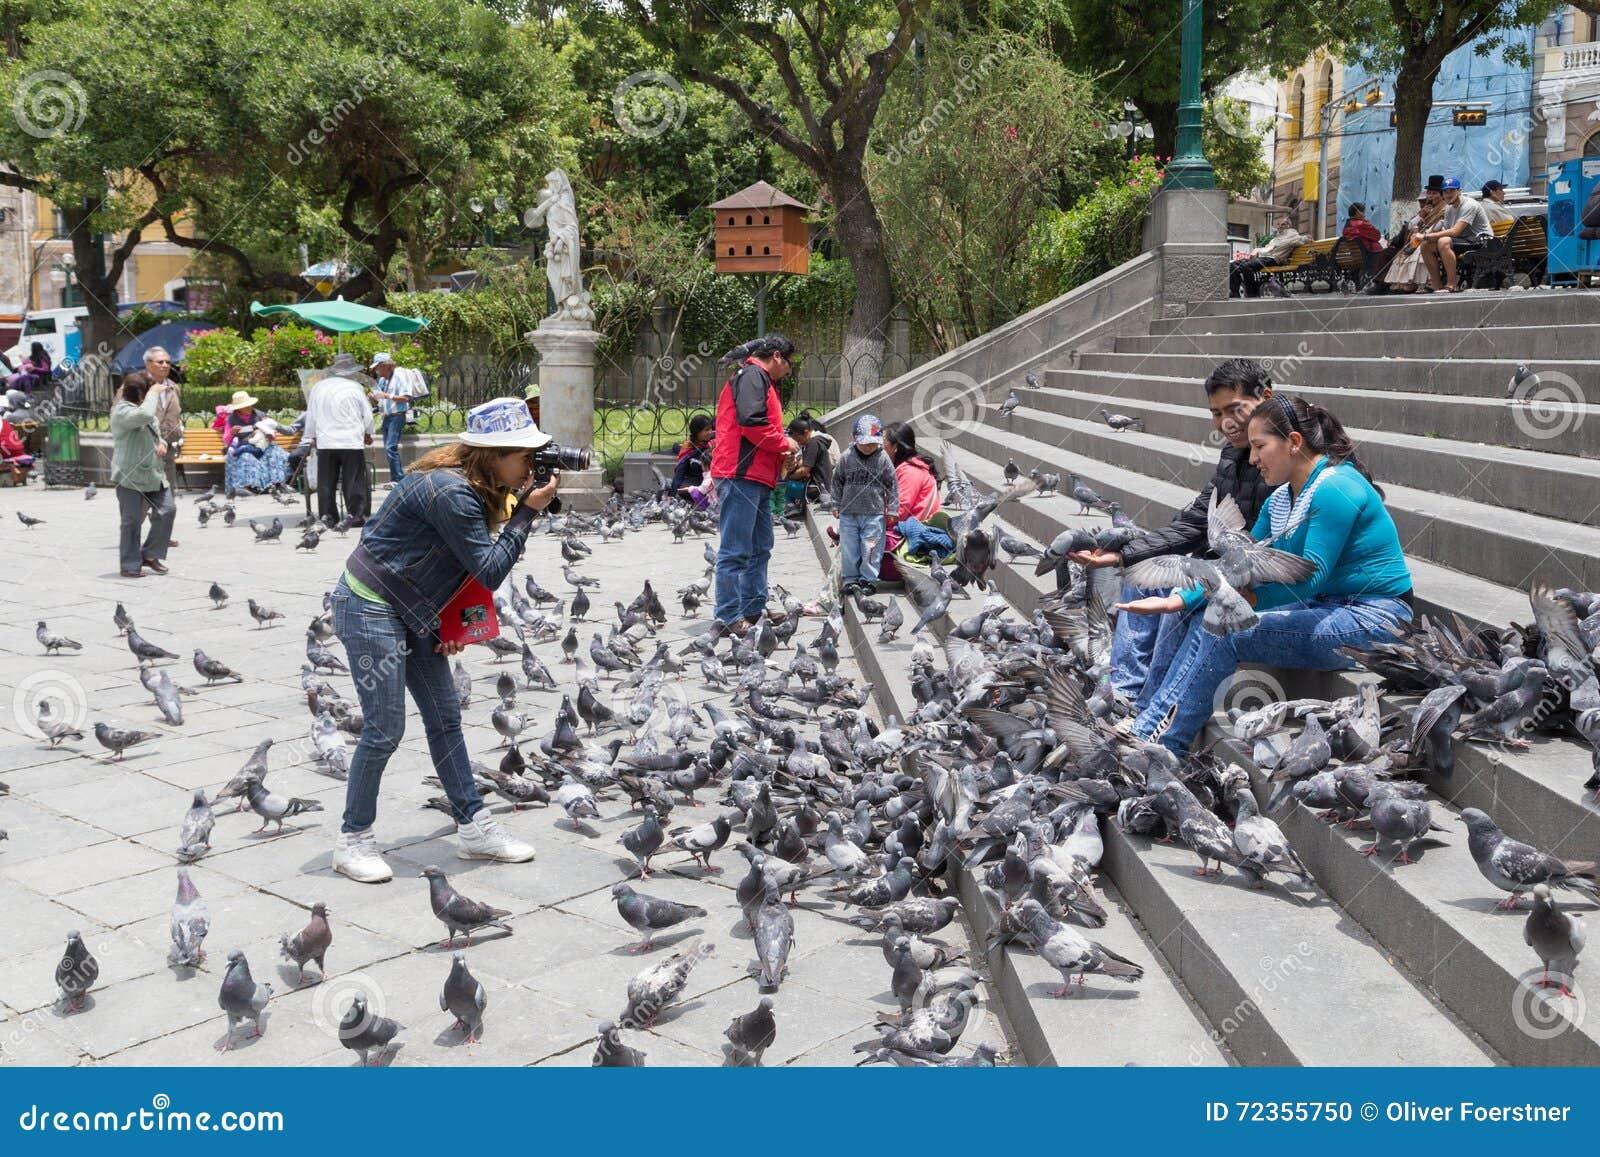 Pigeon feeding on Plaza Murillo in La Paz, Bolivia